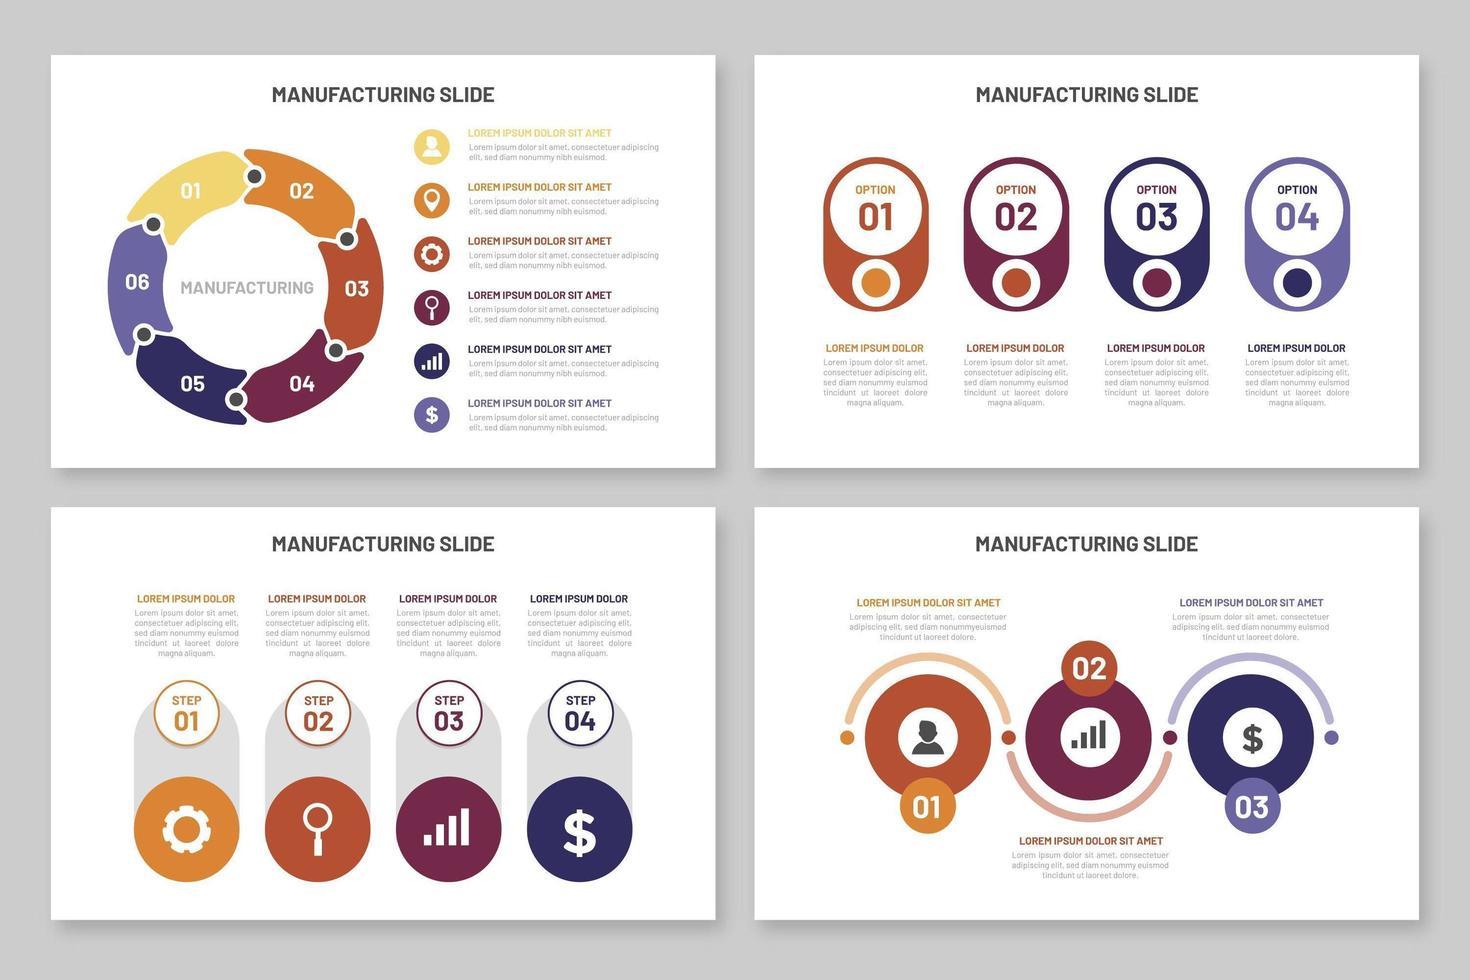 plantilla de fabricación de infografías vector